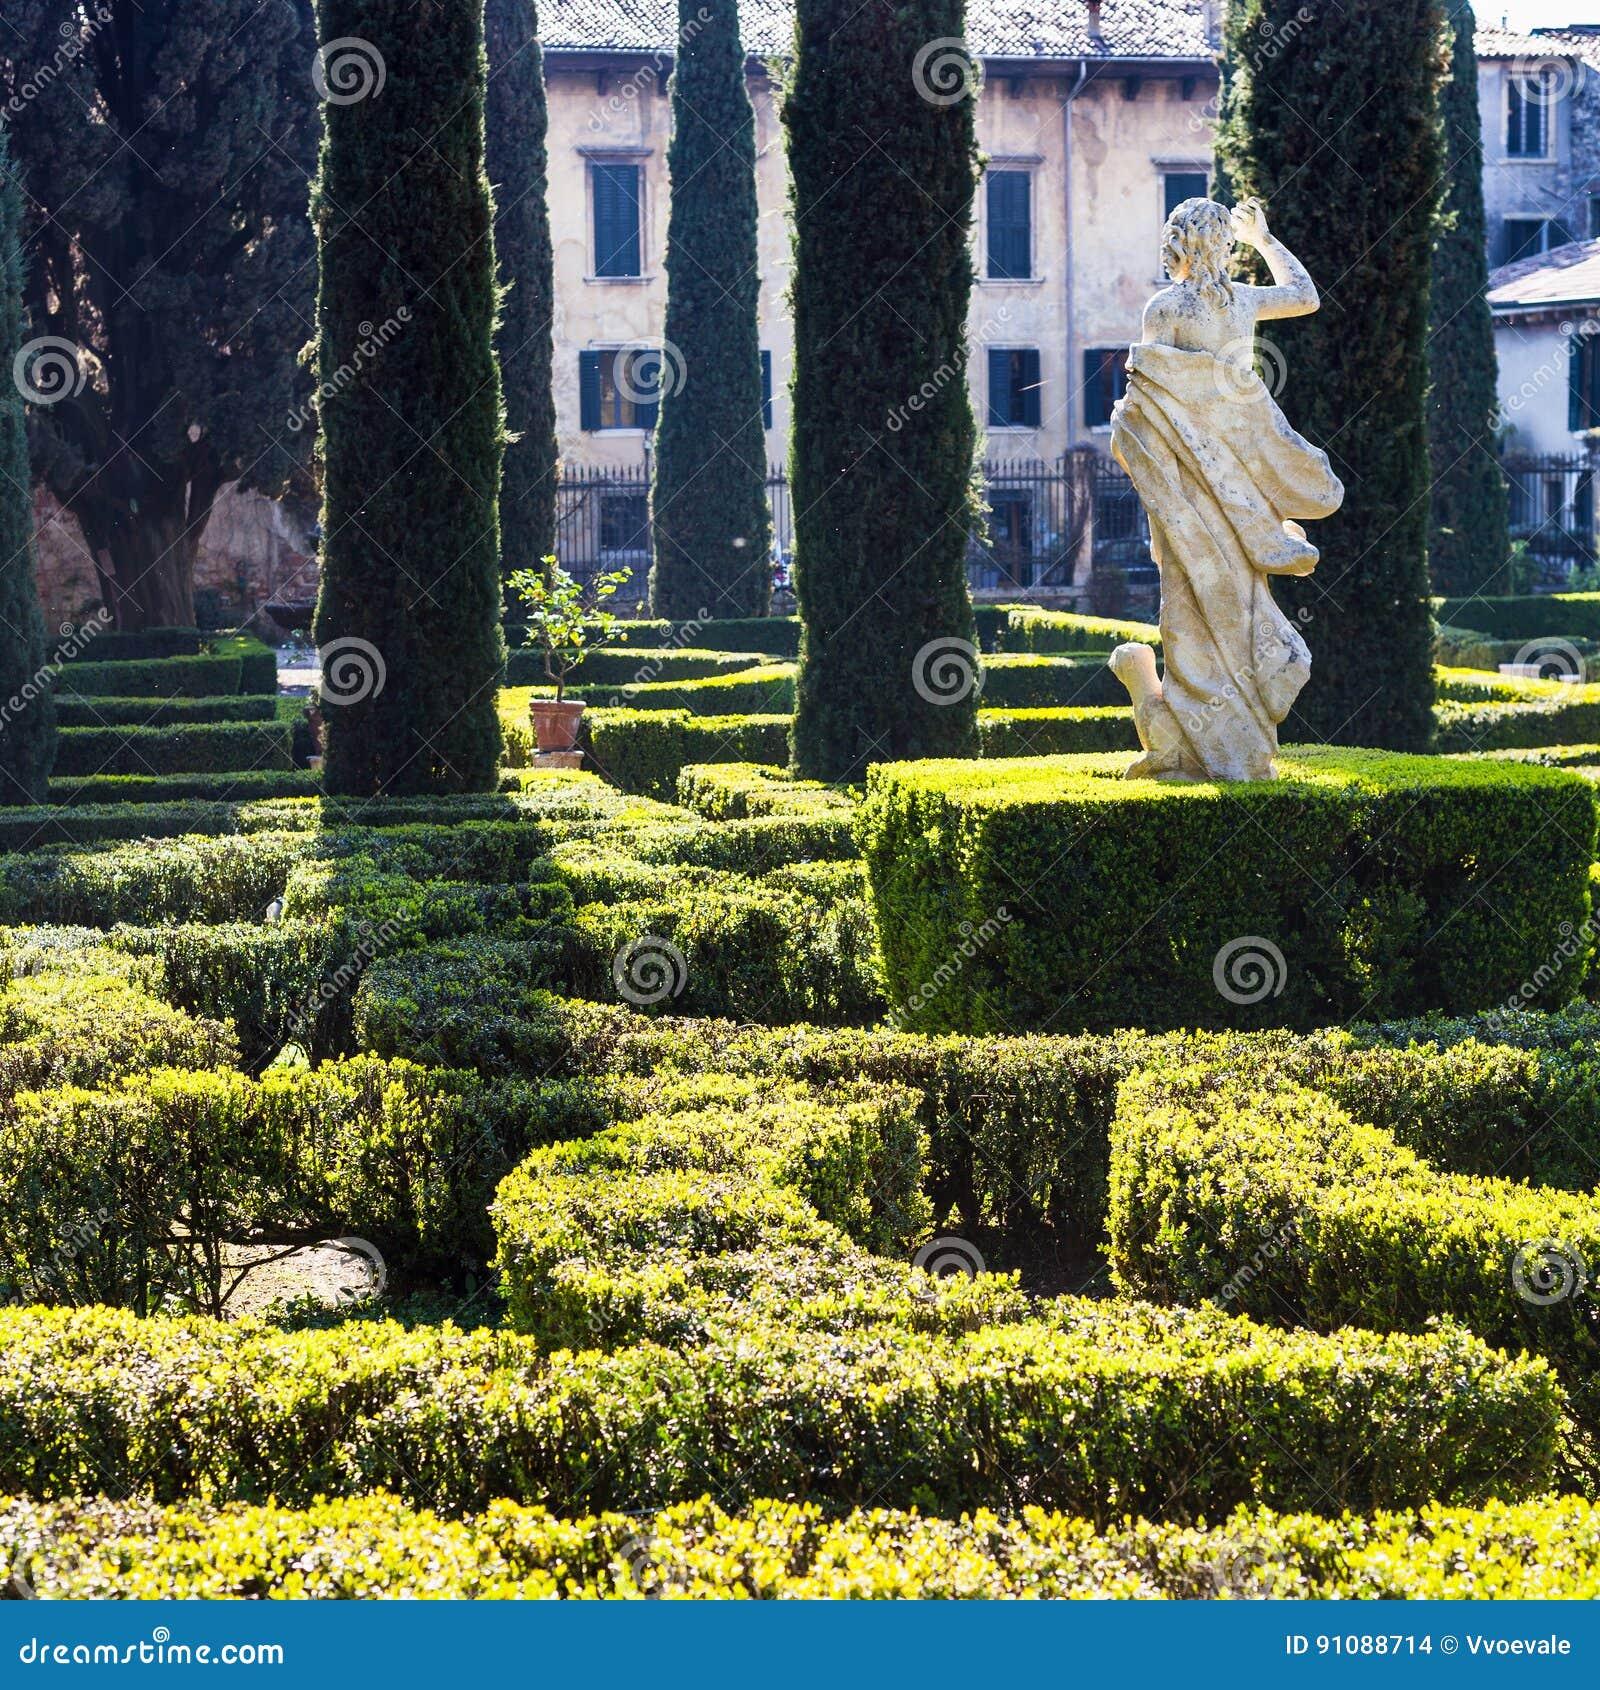 Landscape Design Of Giusti Garden In Verona City Editorial ...